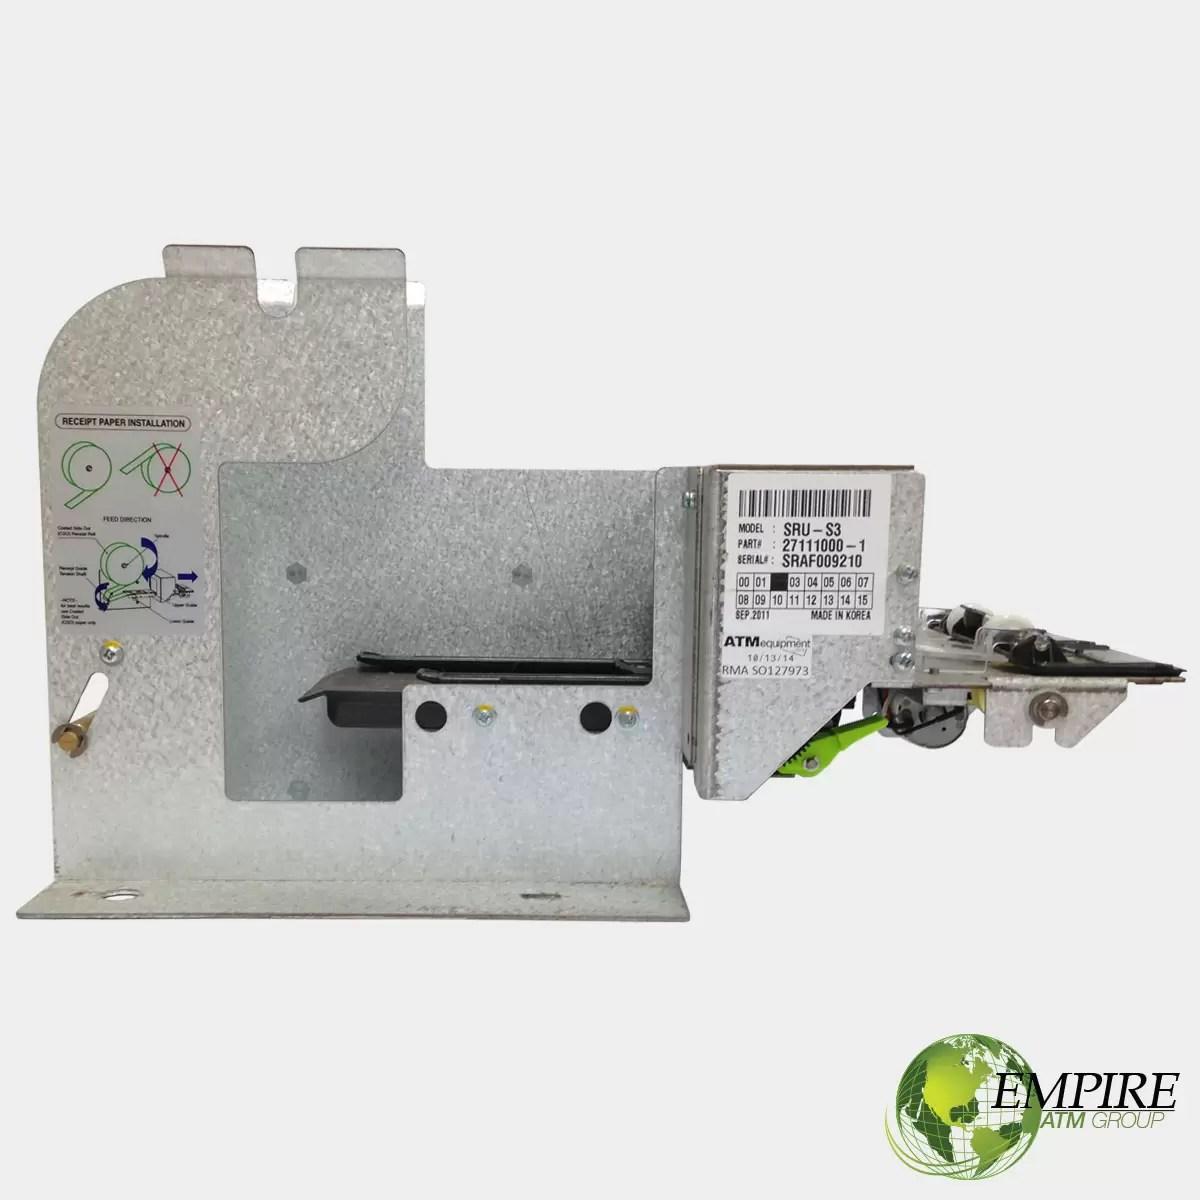 Replacement Printer